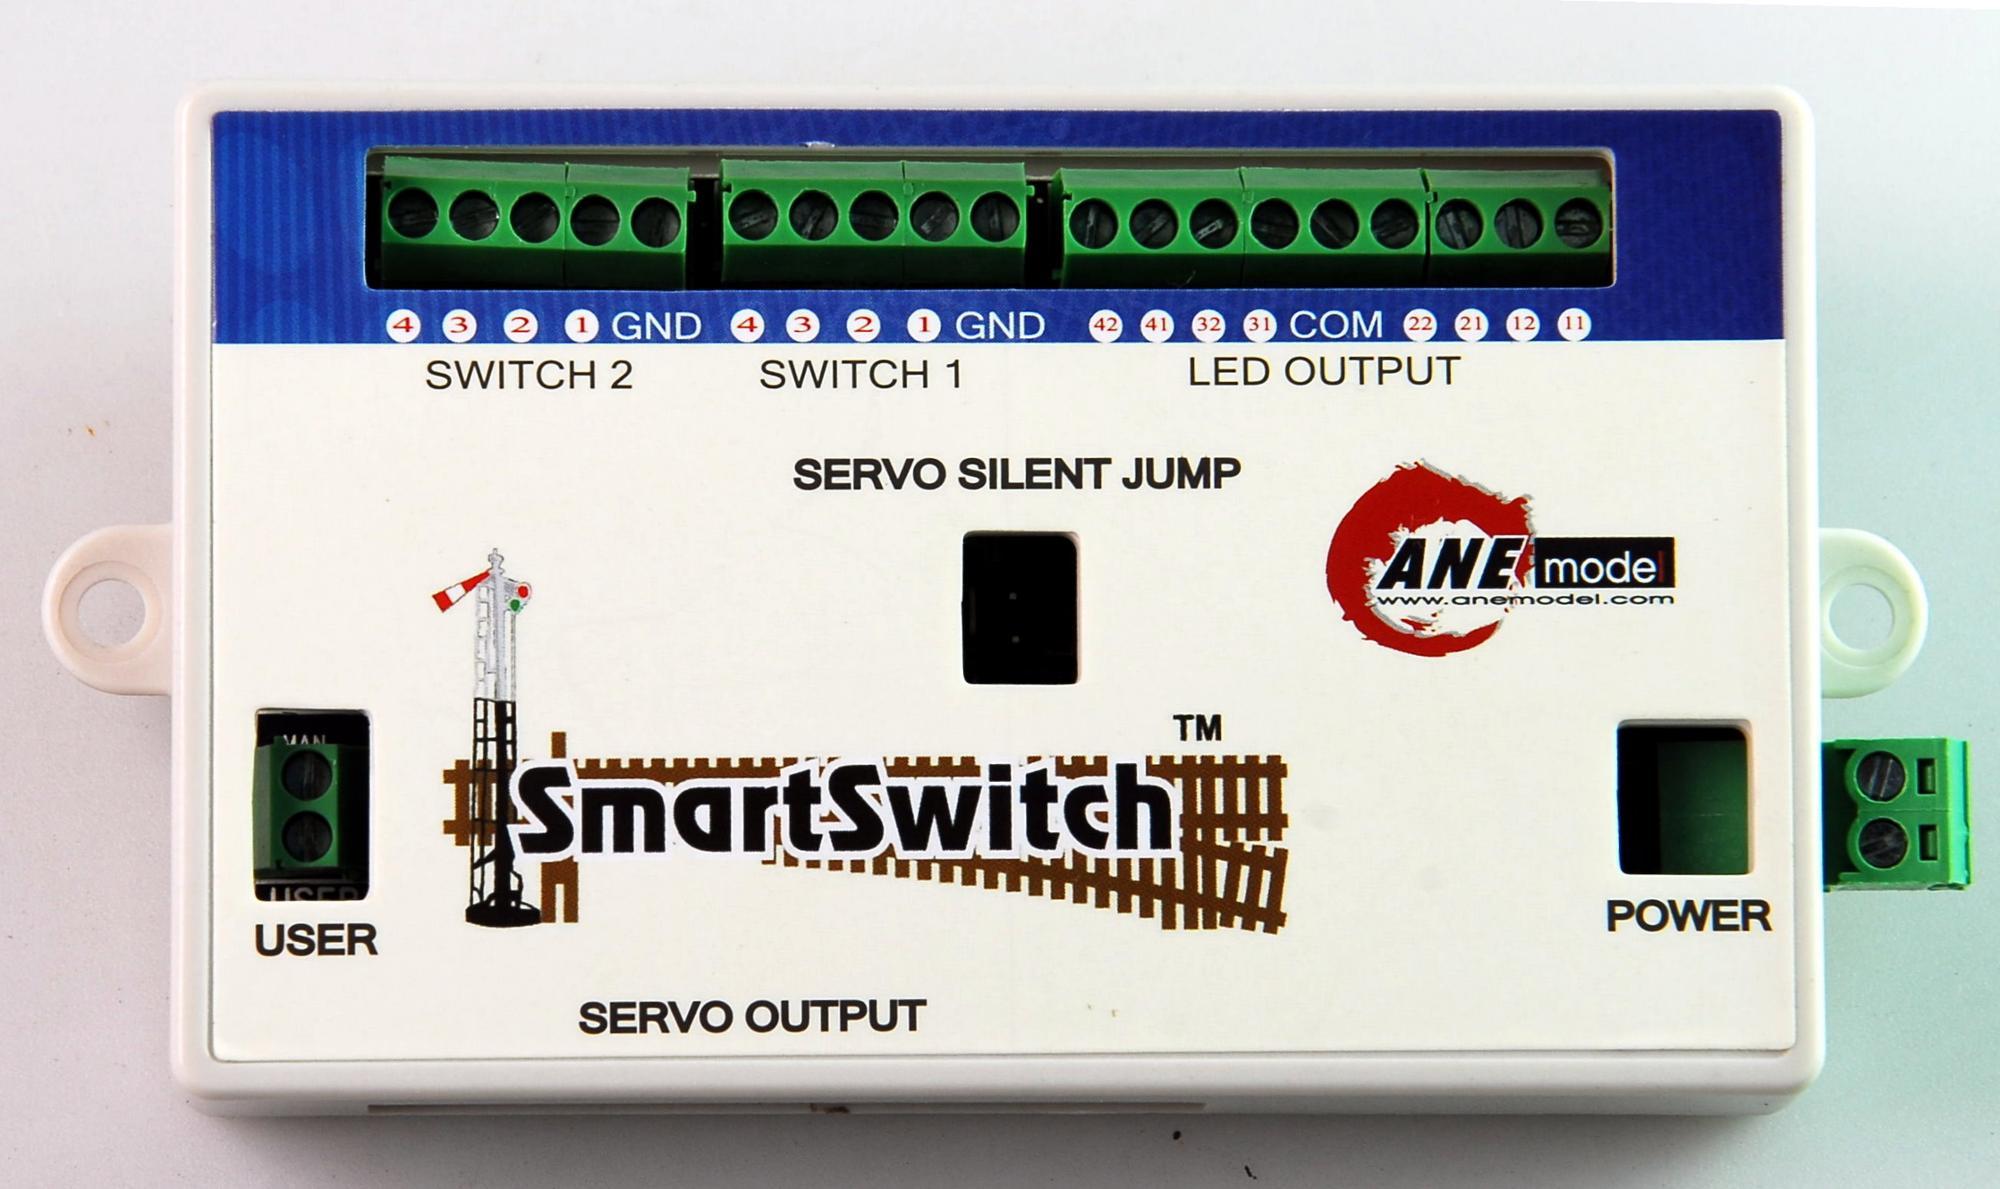 ANE Модель Тайвань A005 SmartSwitch Jumbo Set